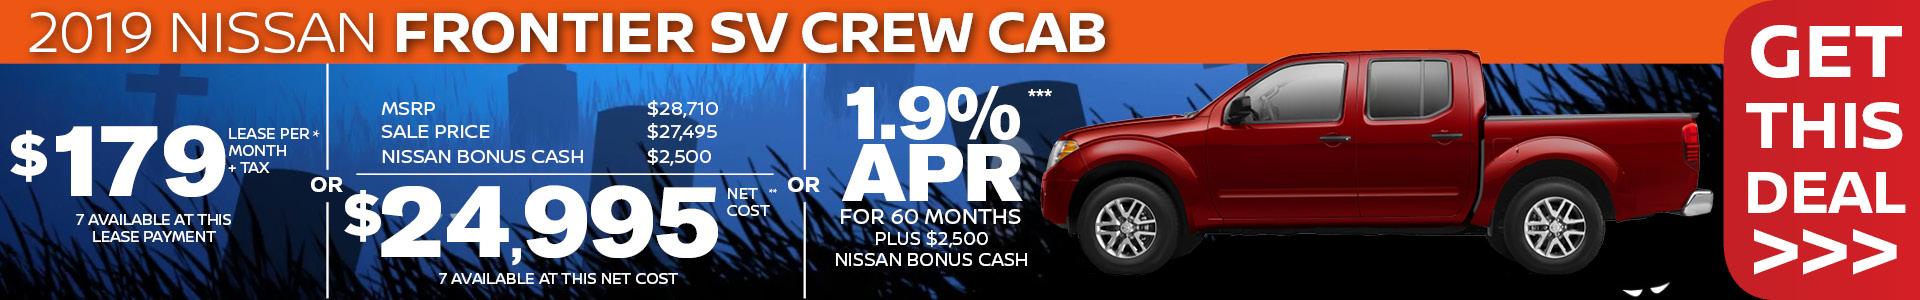 Mossy Nissan - Nissan Frontier SV Crew SRP